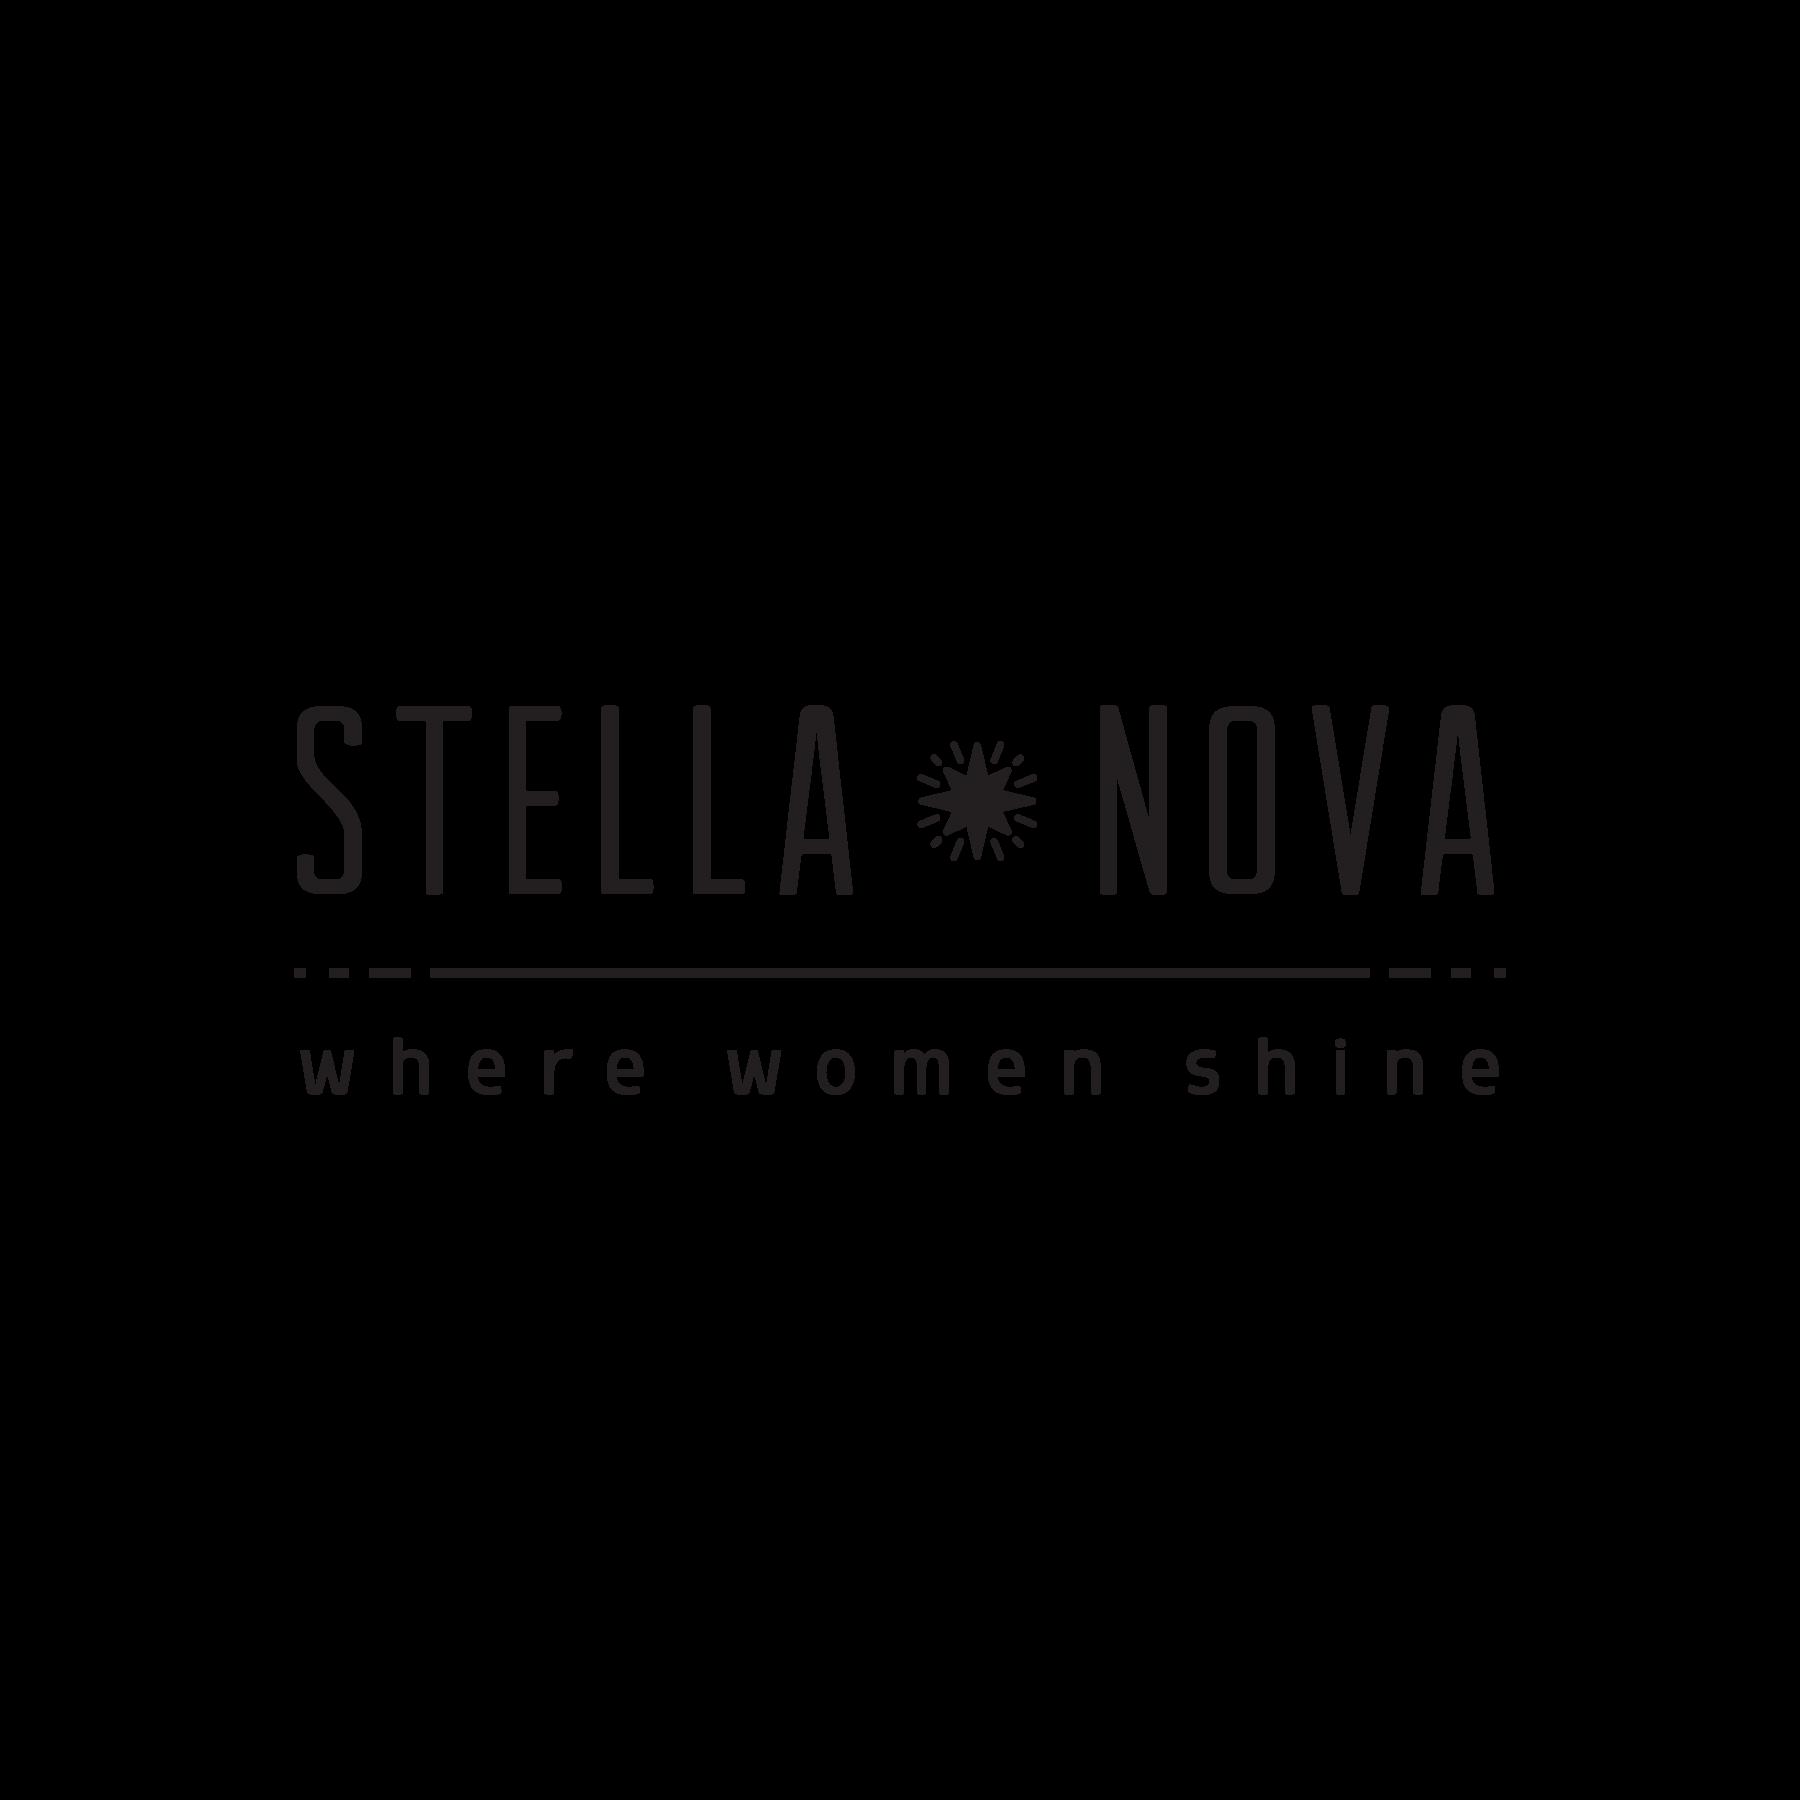 Stella-Nova_black.png